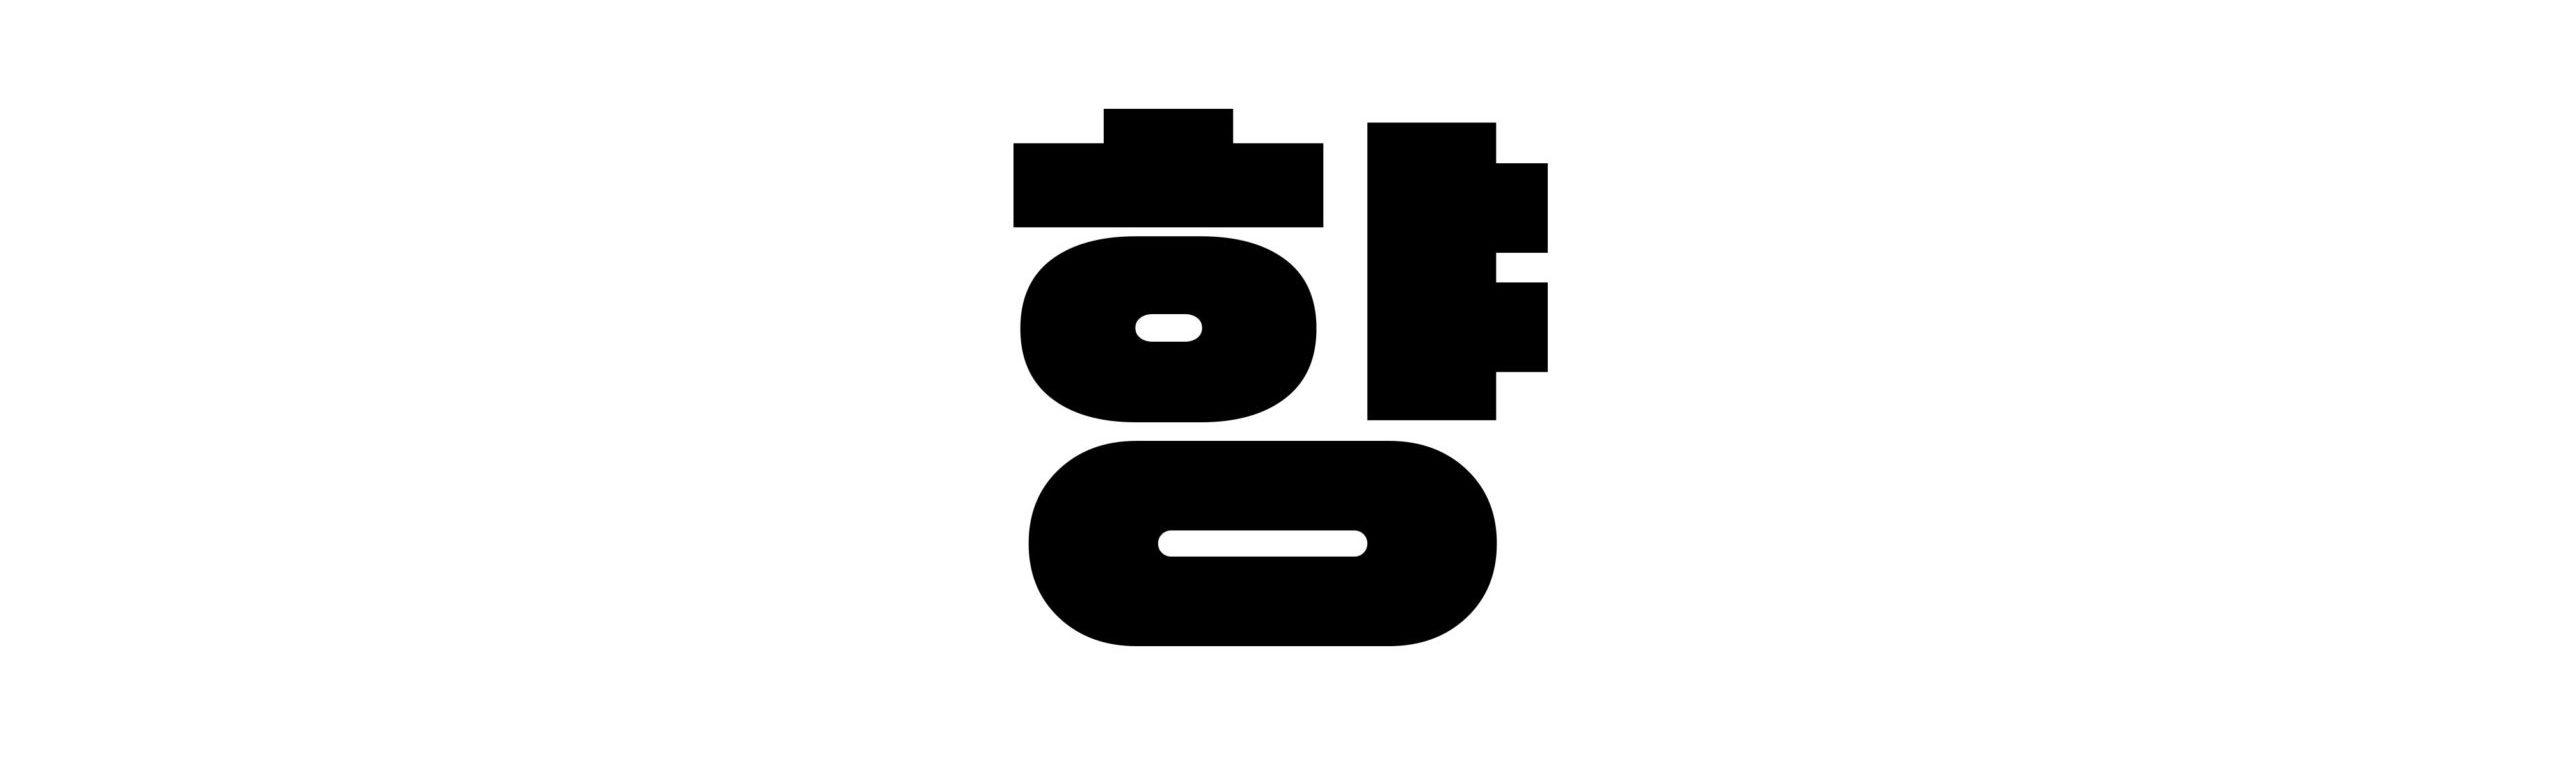 Korean PerfumeArtboard 1